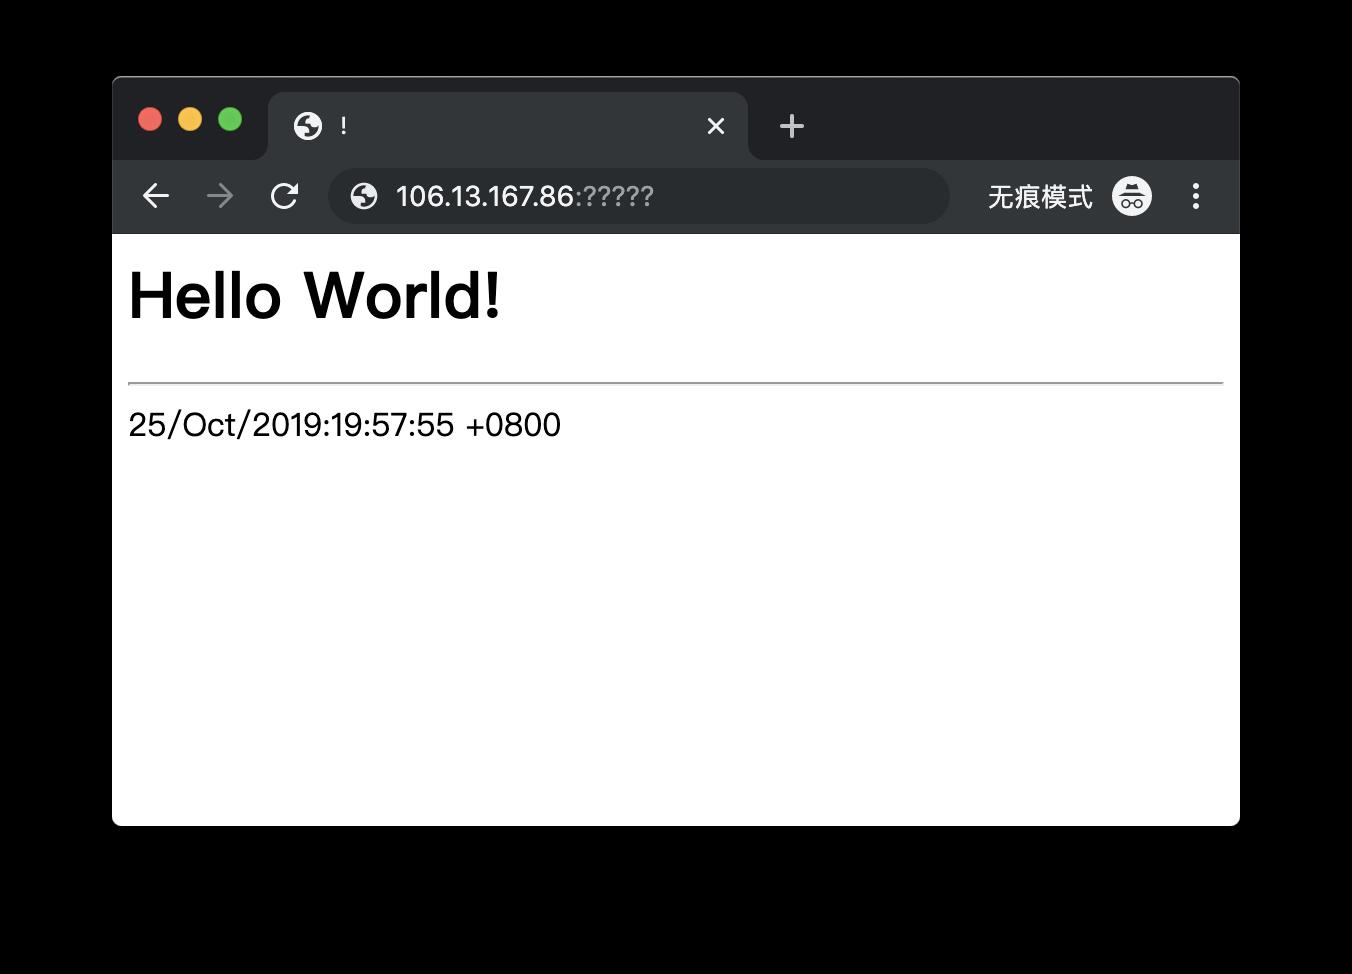 屏幕快照 2019-10-25 19.57.59.png